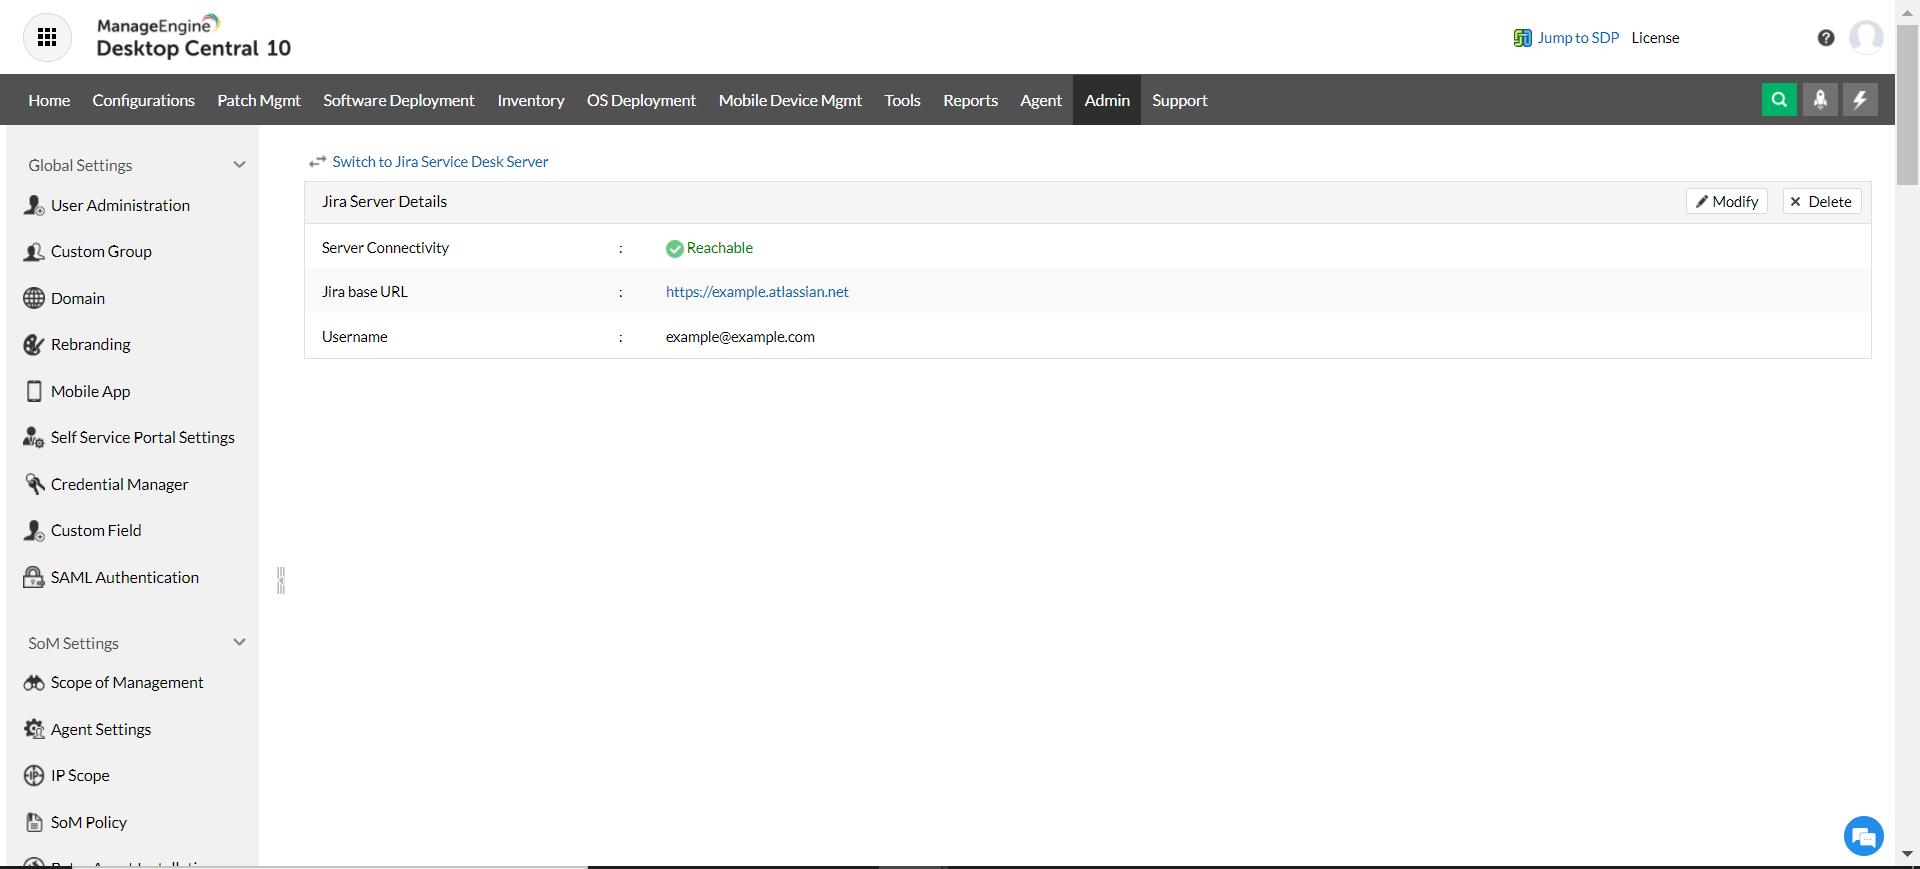 Desktop Central and Jira Service Management Cloud integration complete